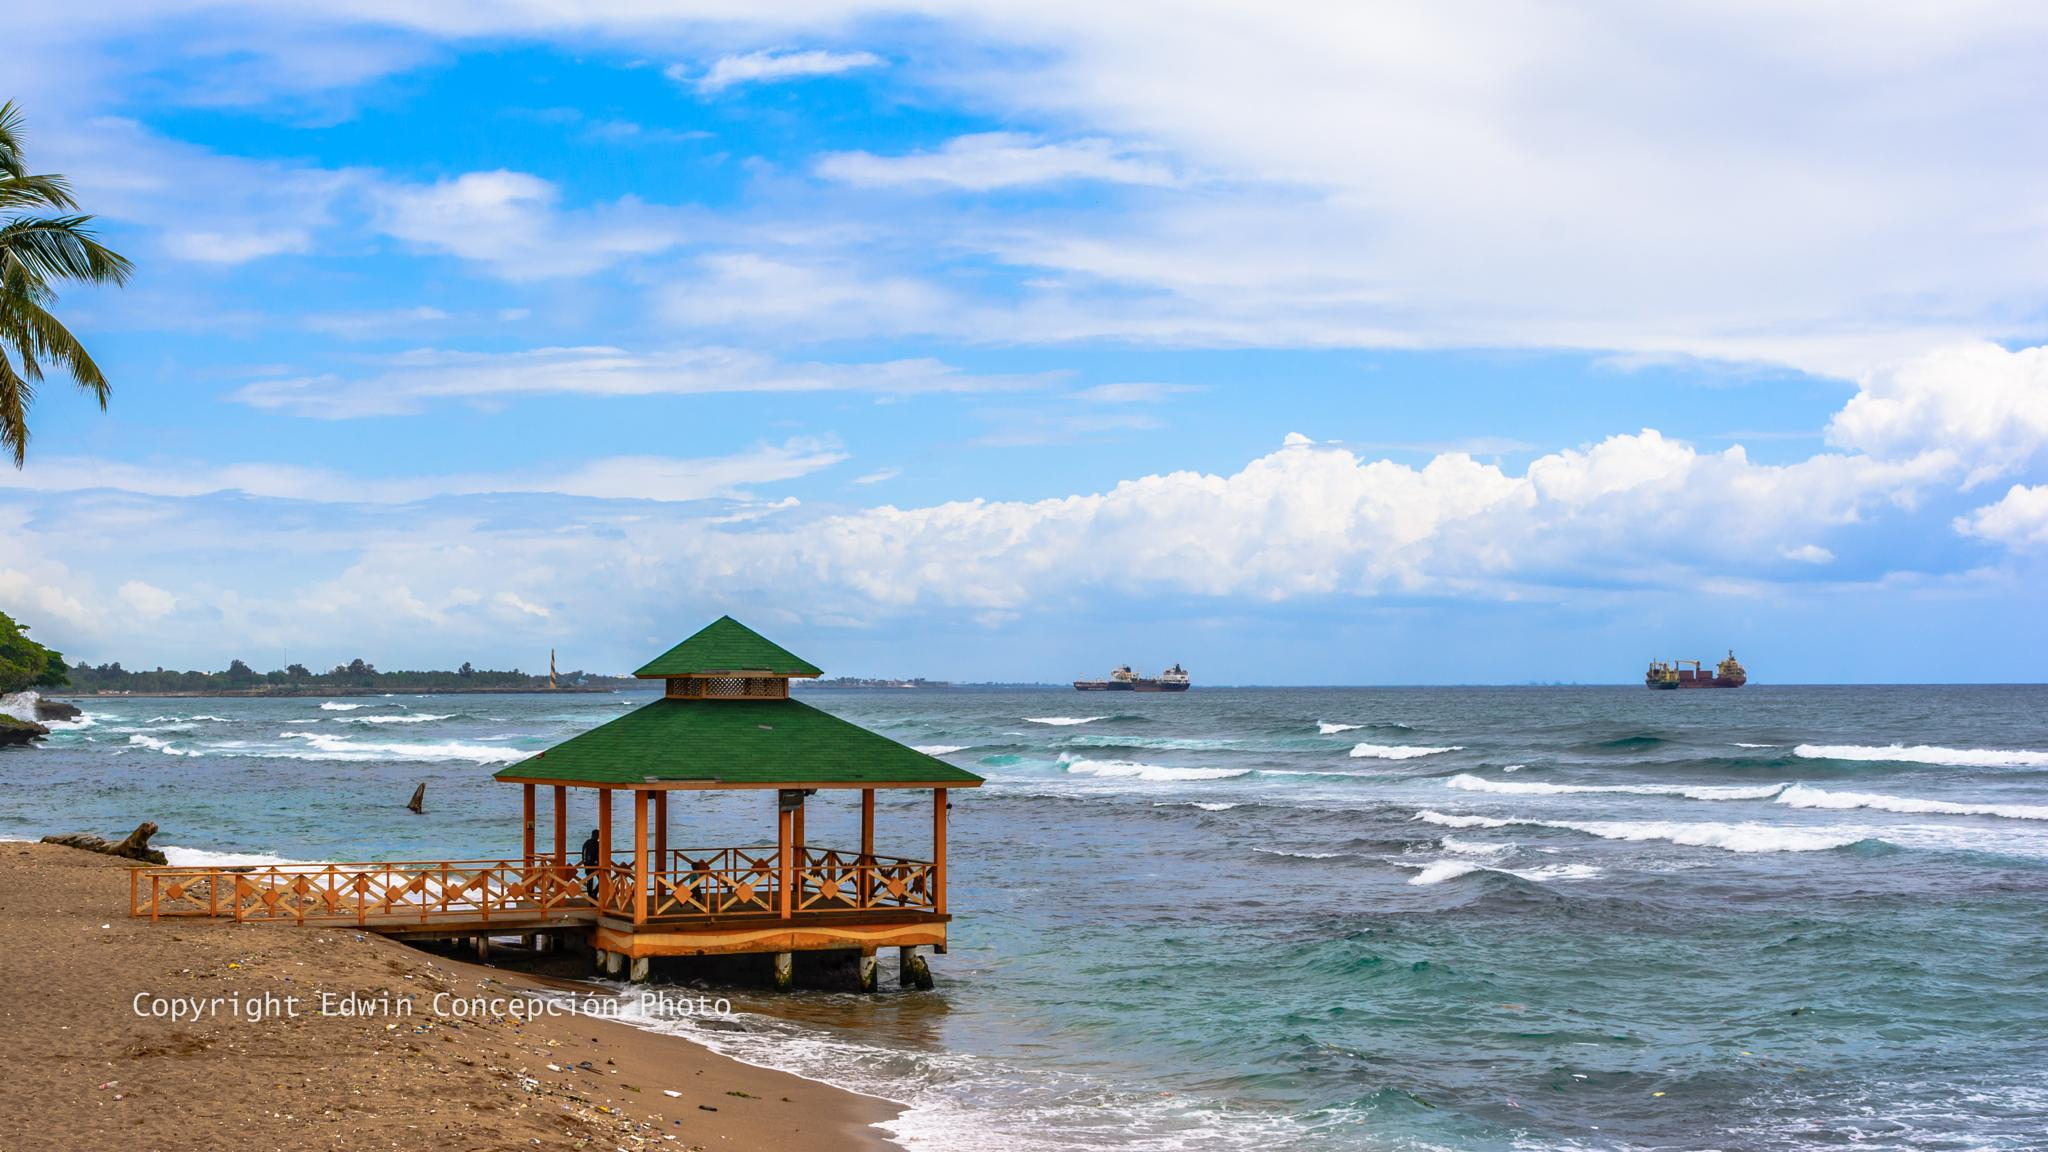 Playa de Guibia, Santo Domingo, Dominican Republic by Edwin Concepción